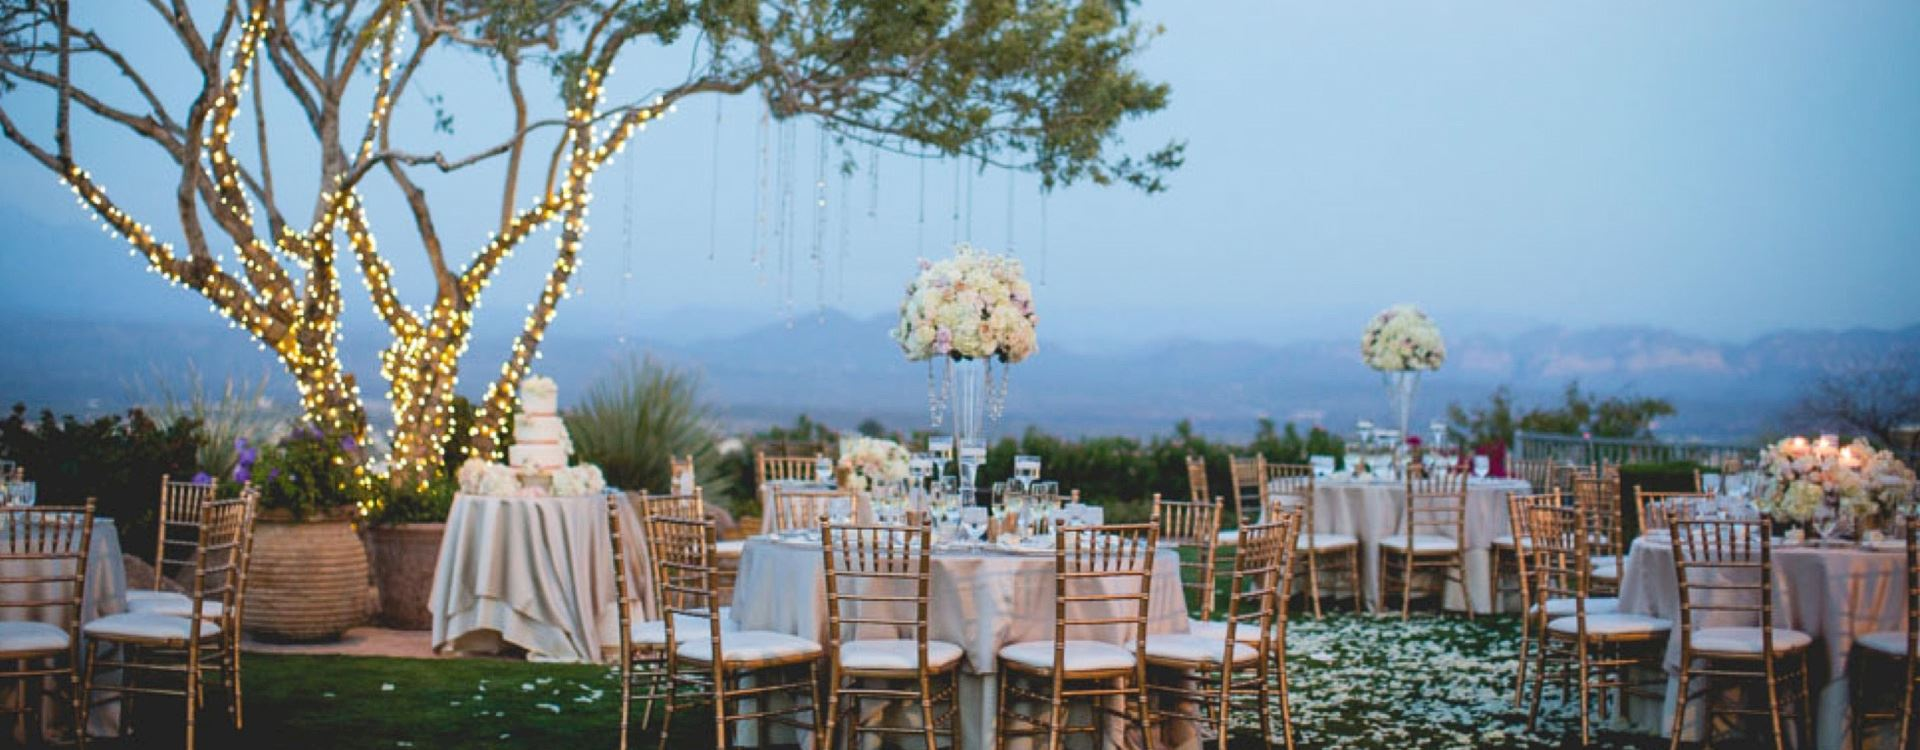 Weddings at Hotel Arizona